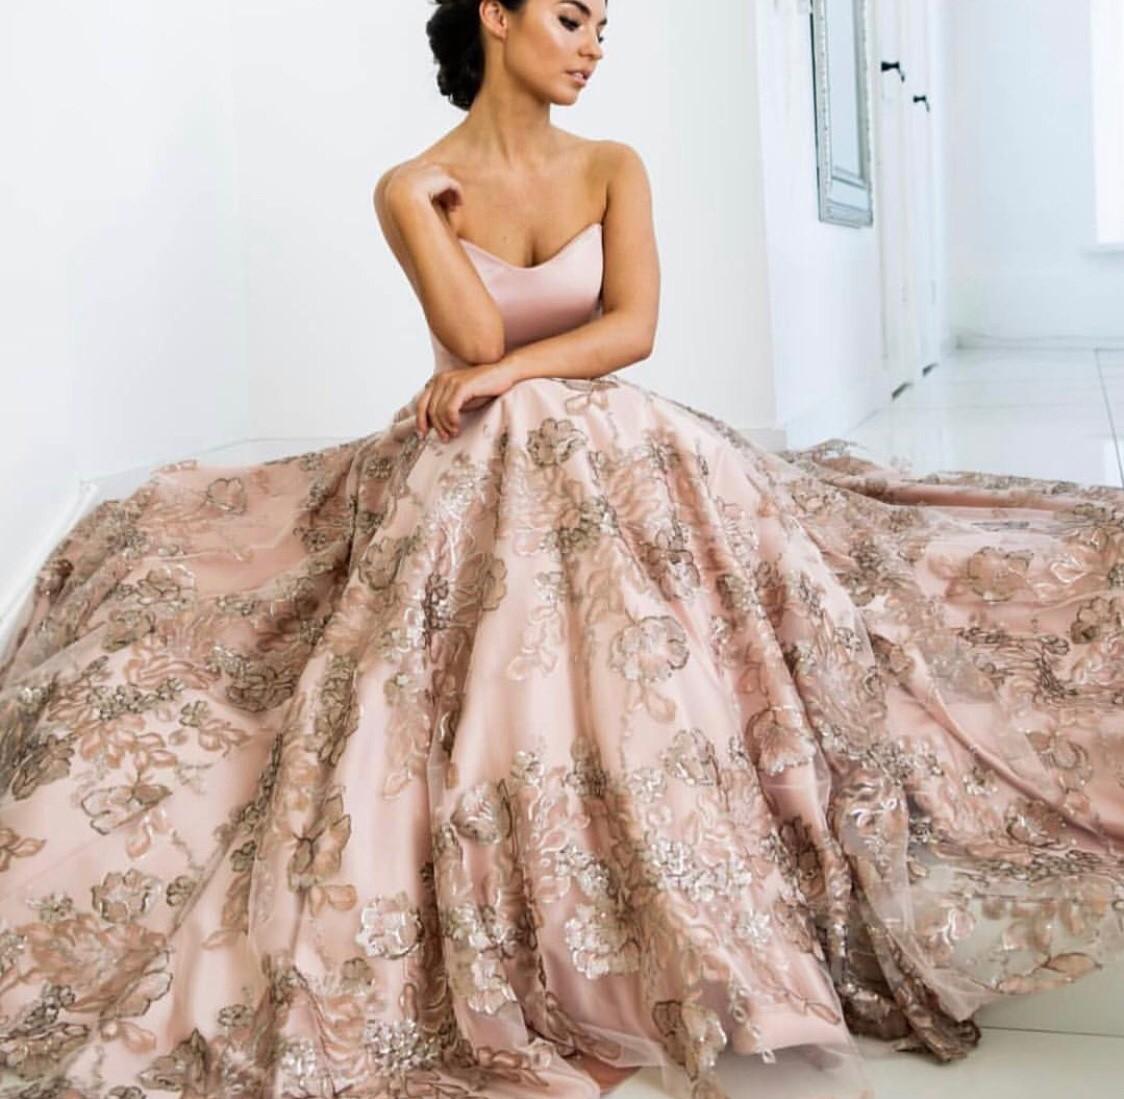 Nicola Anne Intense New Wedding Dress On Sale 58% Off